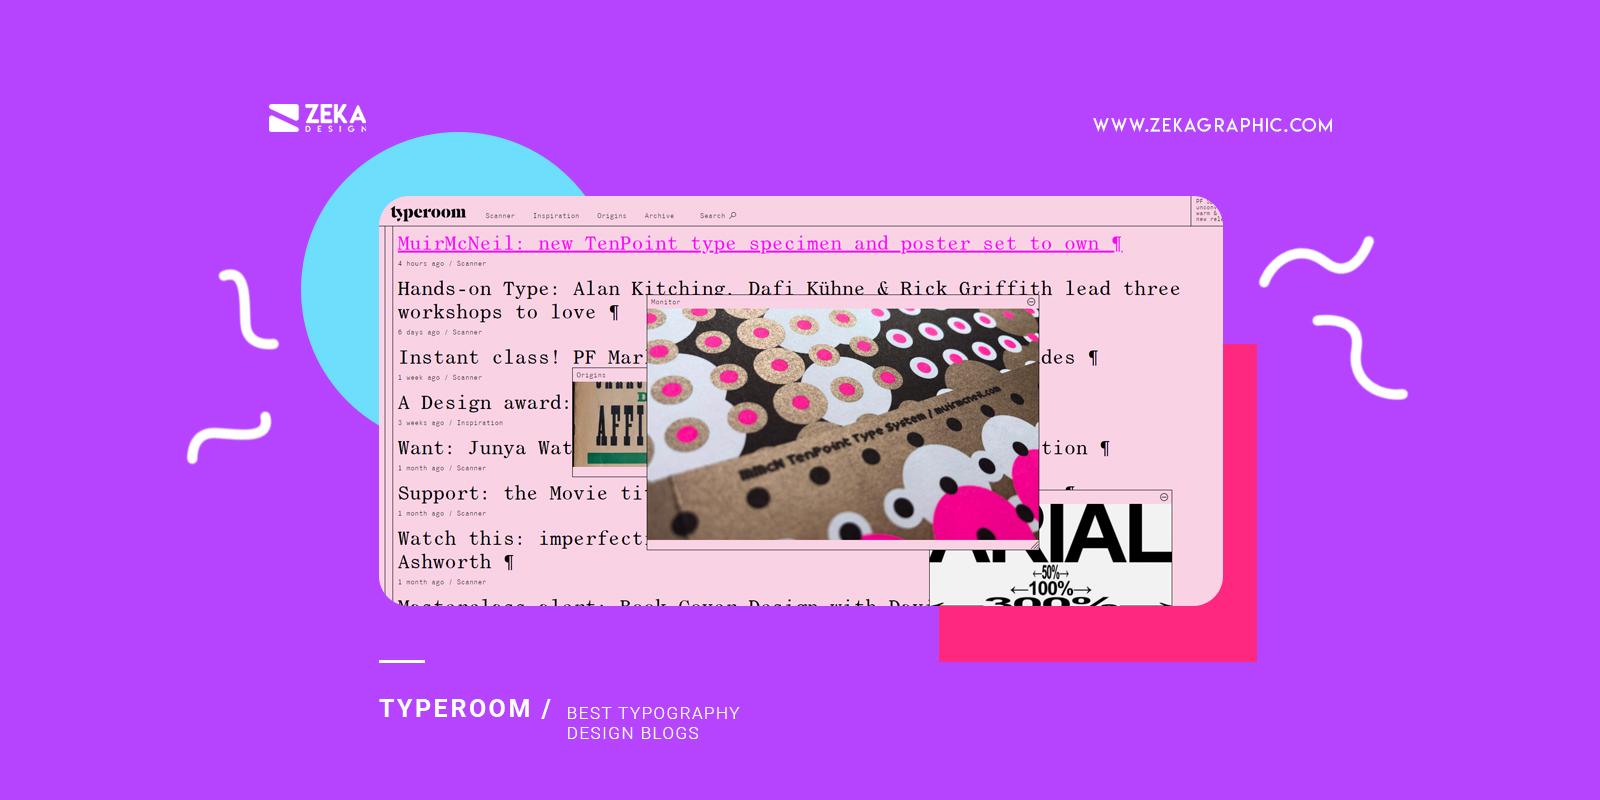 Typeoom Best Typography Design Blogs